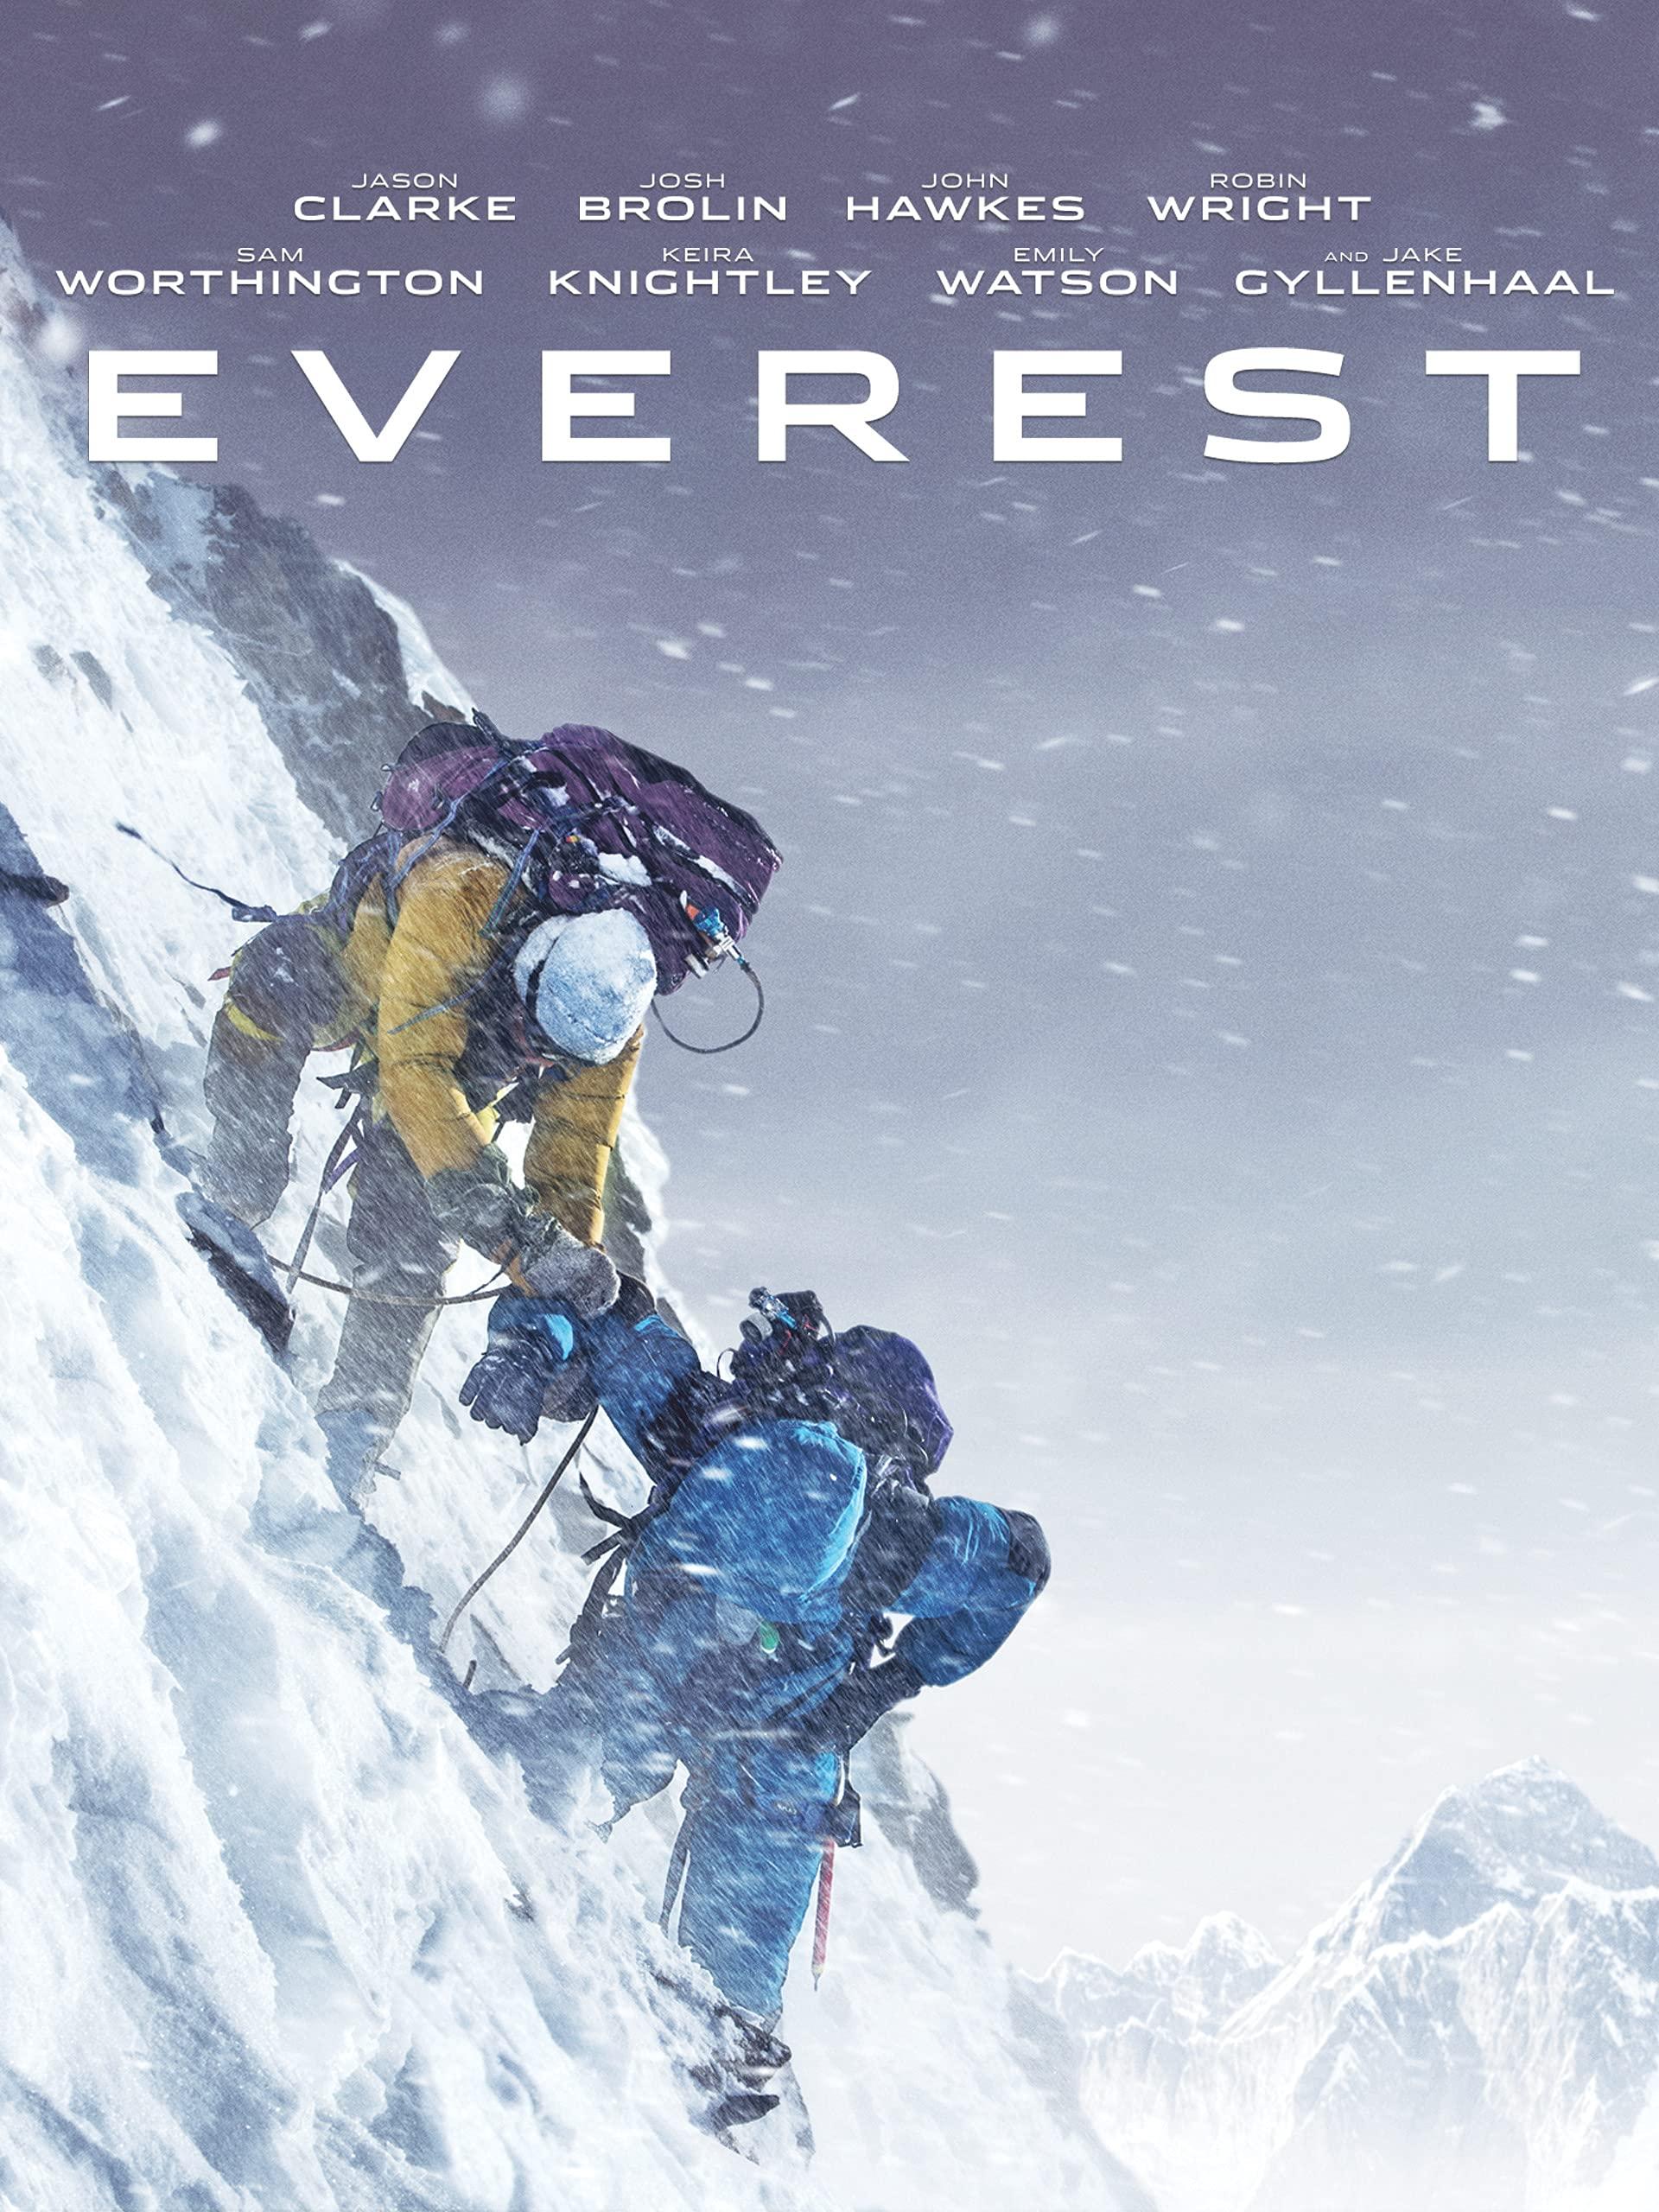 Everest (4K UHD) on Amazon Prime Video UK